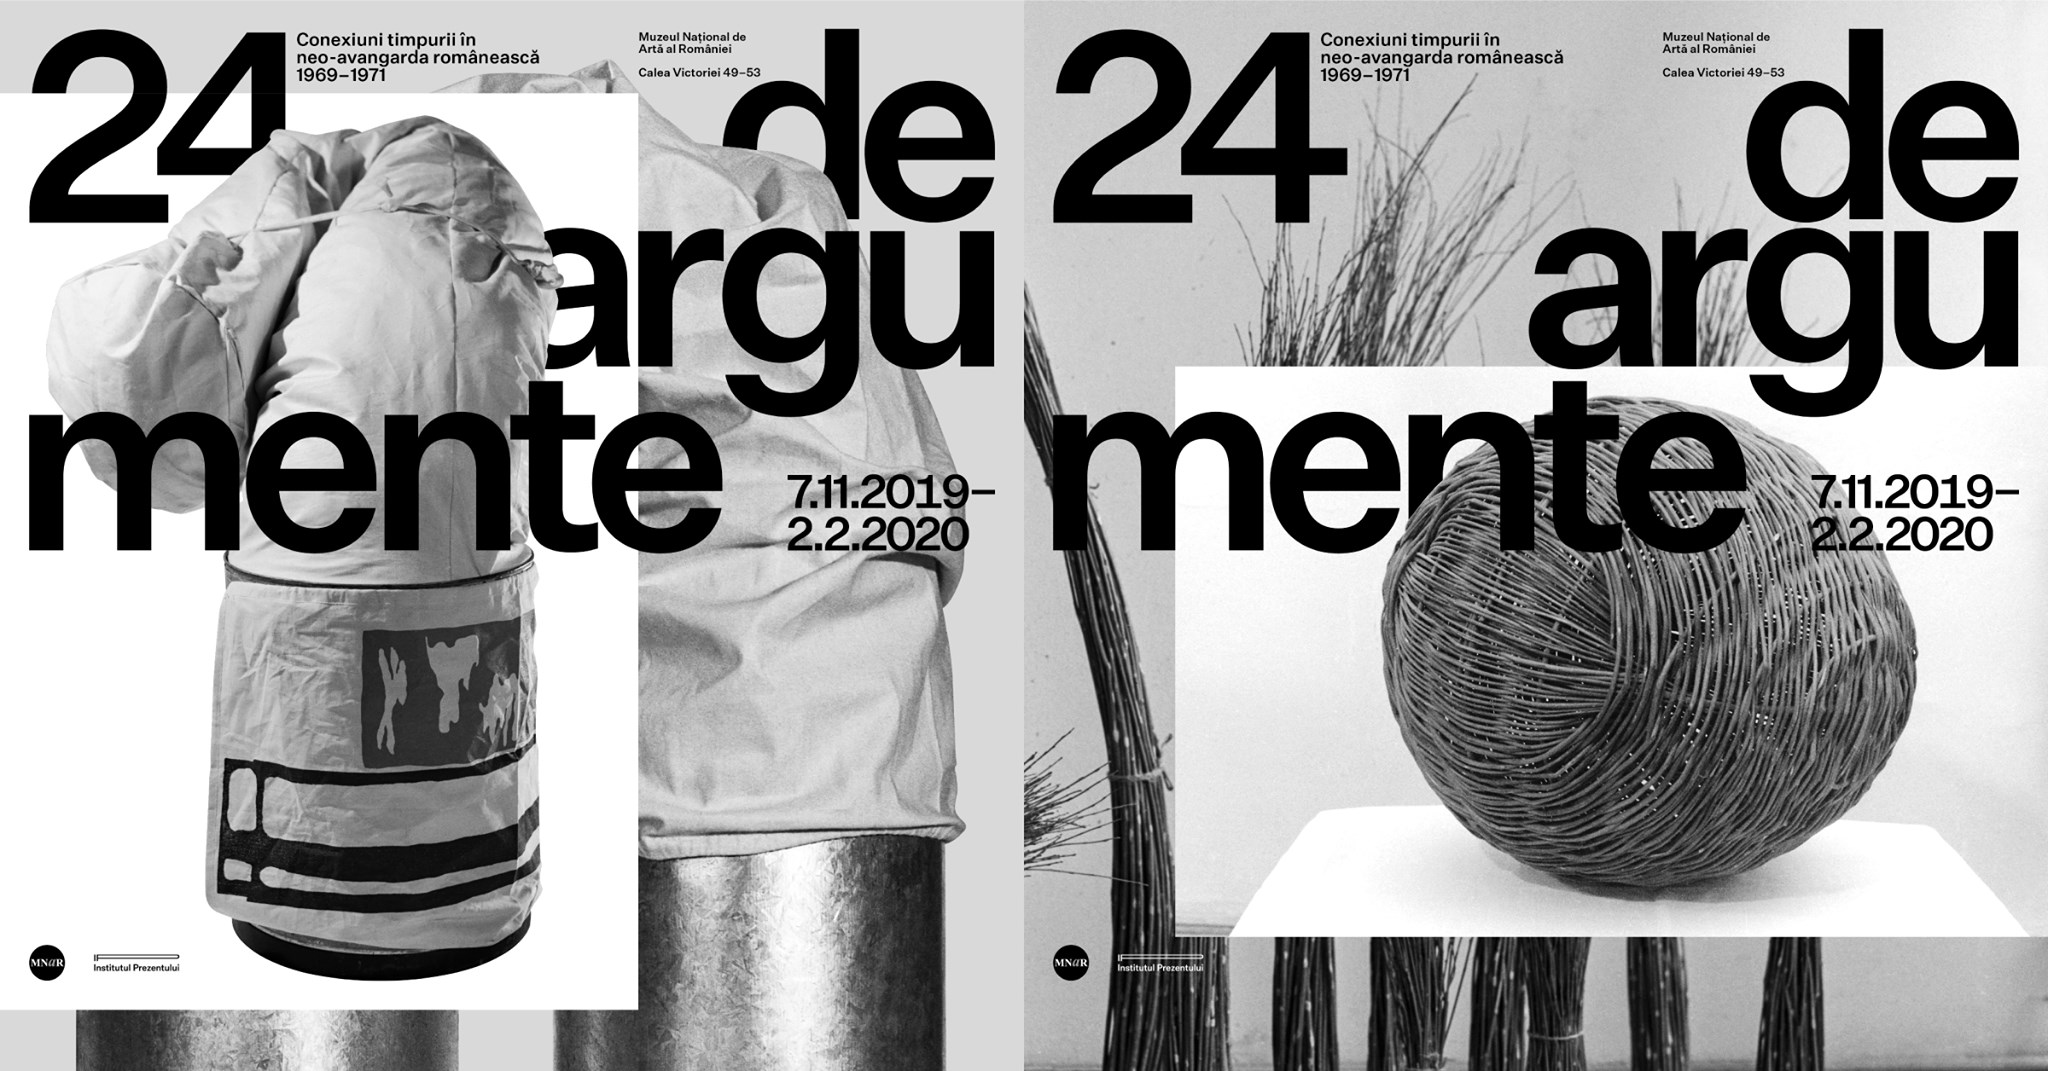 COVER istoria recentă 24 DE ARGUMENTE_MNAR 2019 afiș